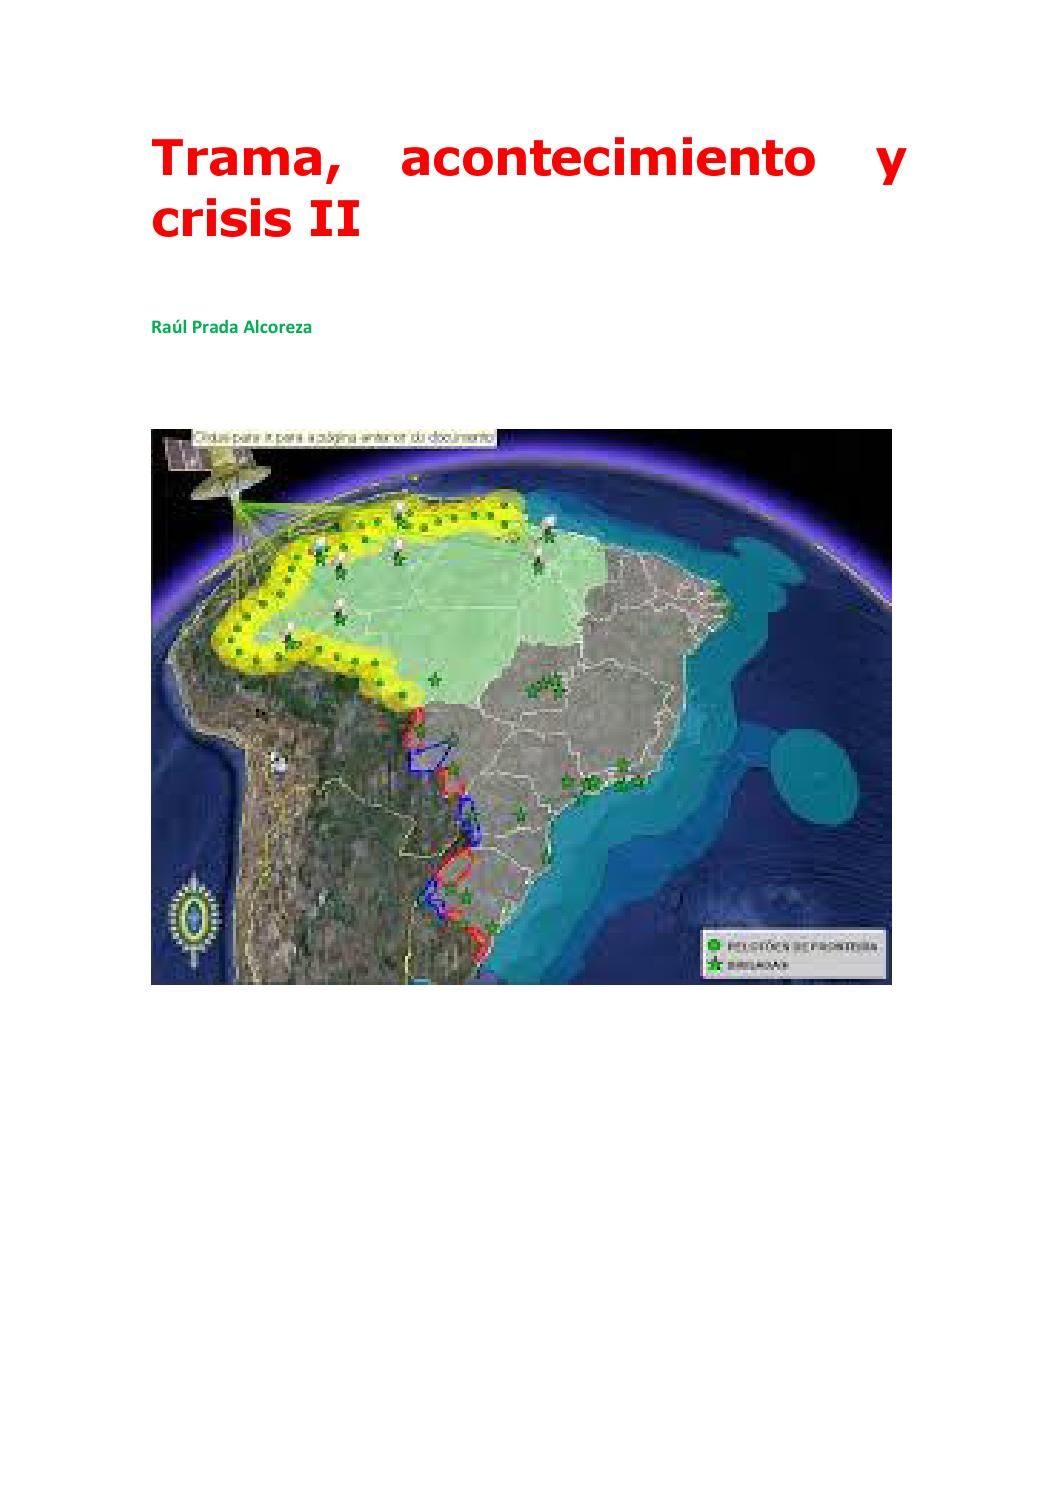 Trama, acontecimiento y crisis ii by Raúl Prada Alcoreza - issuu